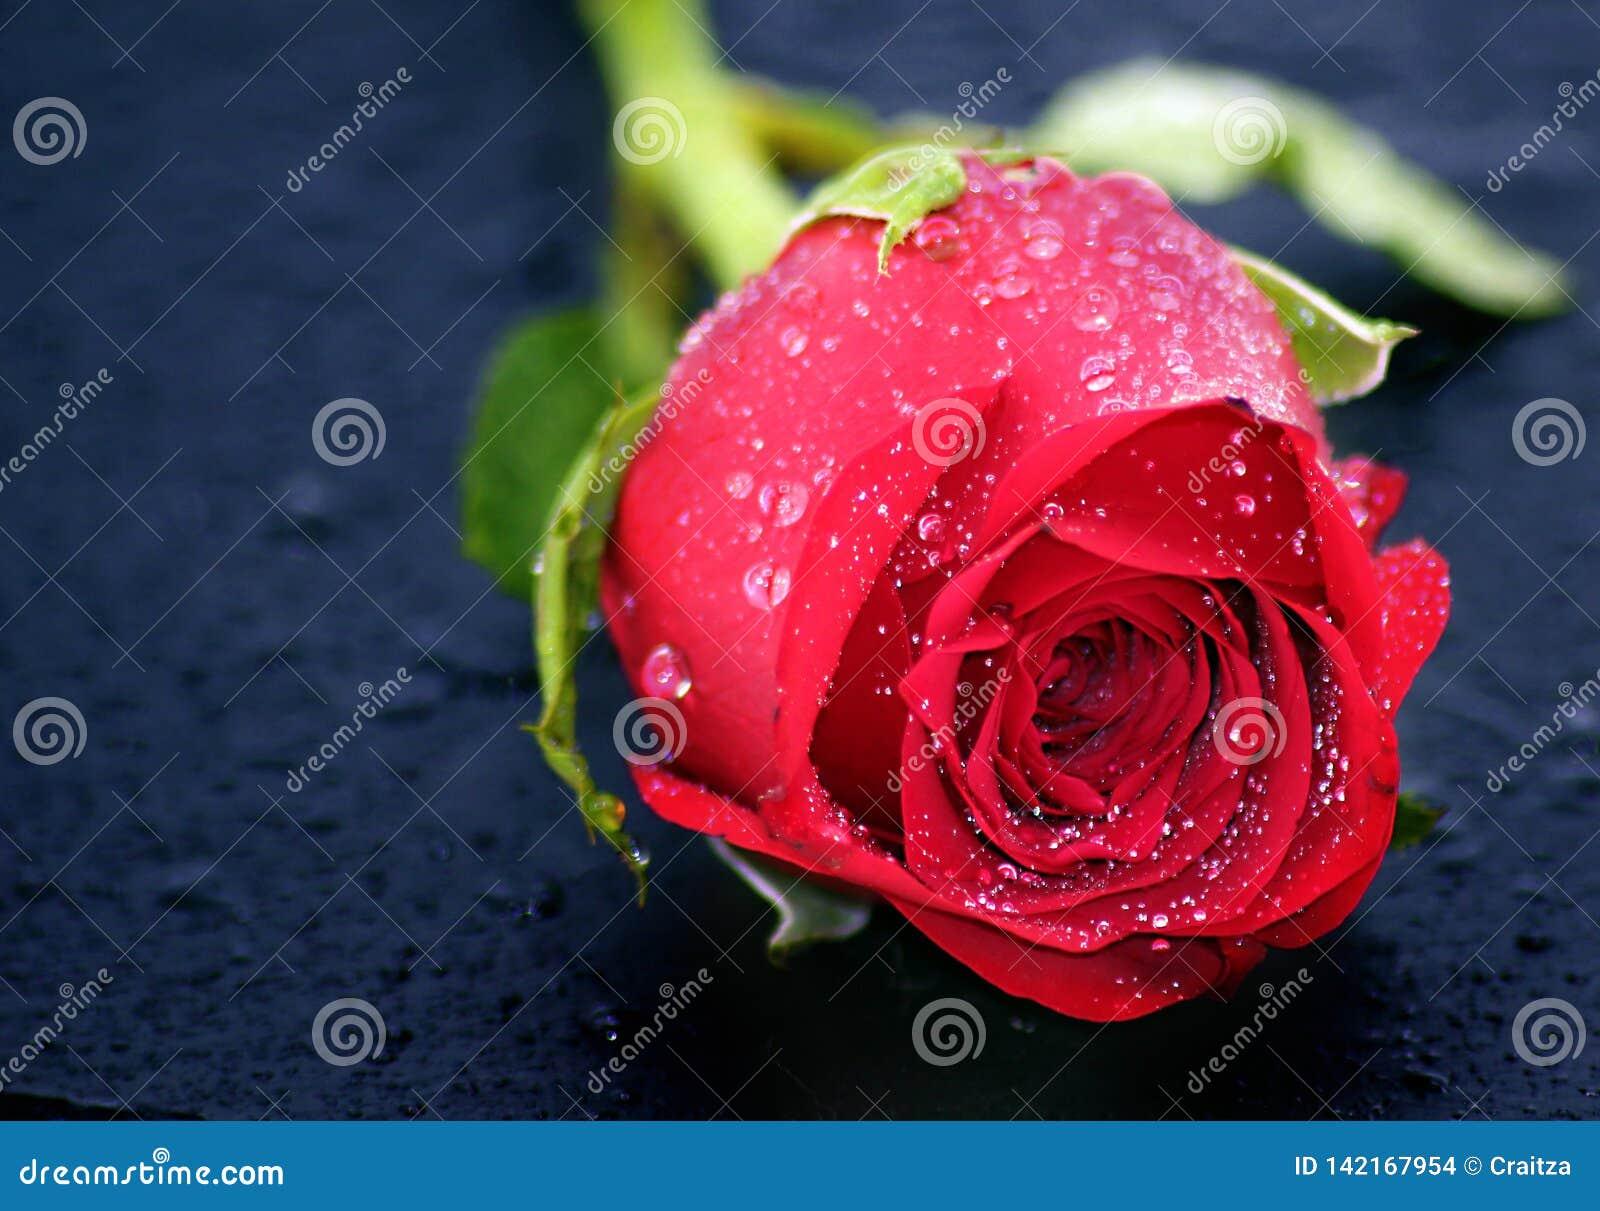 Jonge Mooie Rose With Early Morning Dew laat vallen Close-up